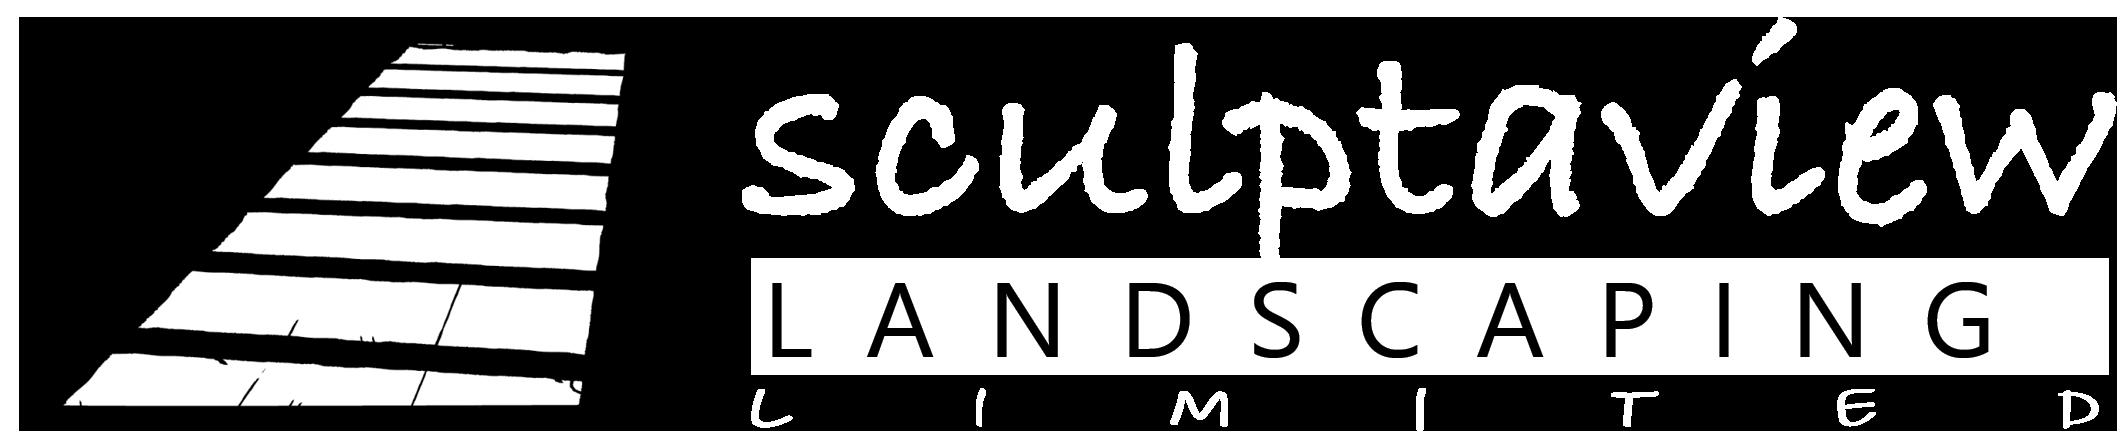 Sculptaview Landscaping Ltd